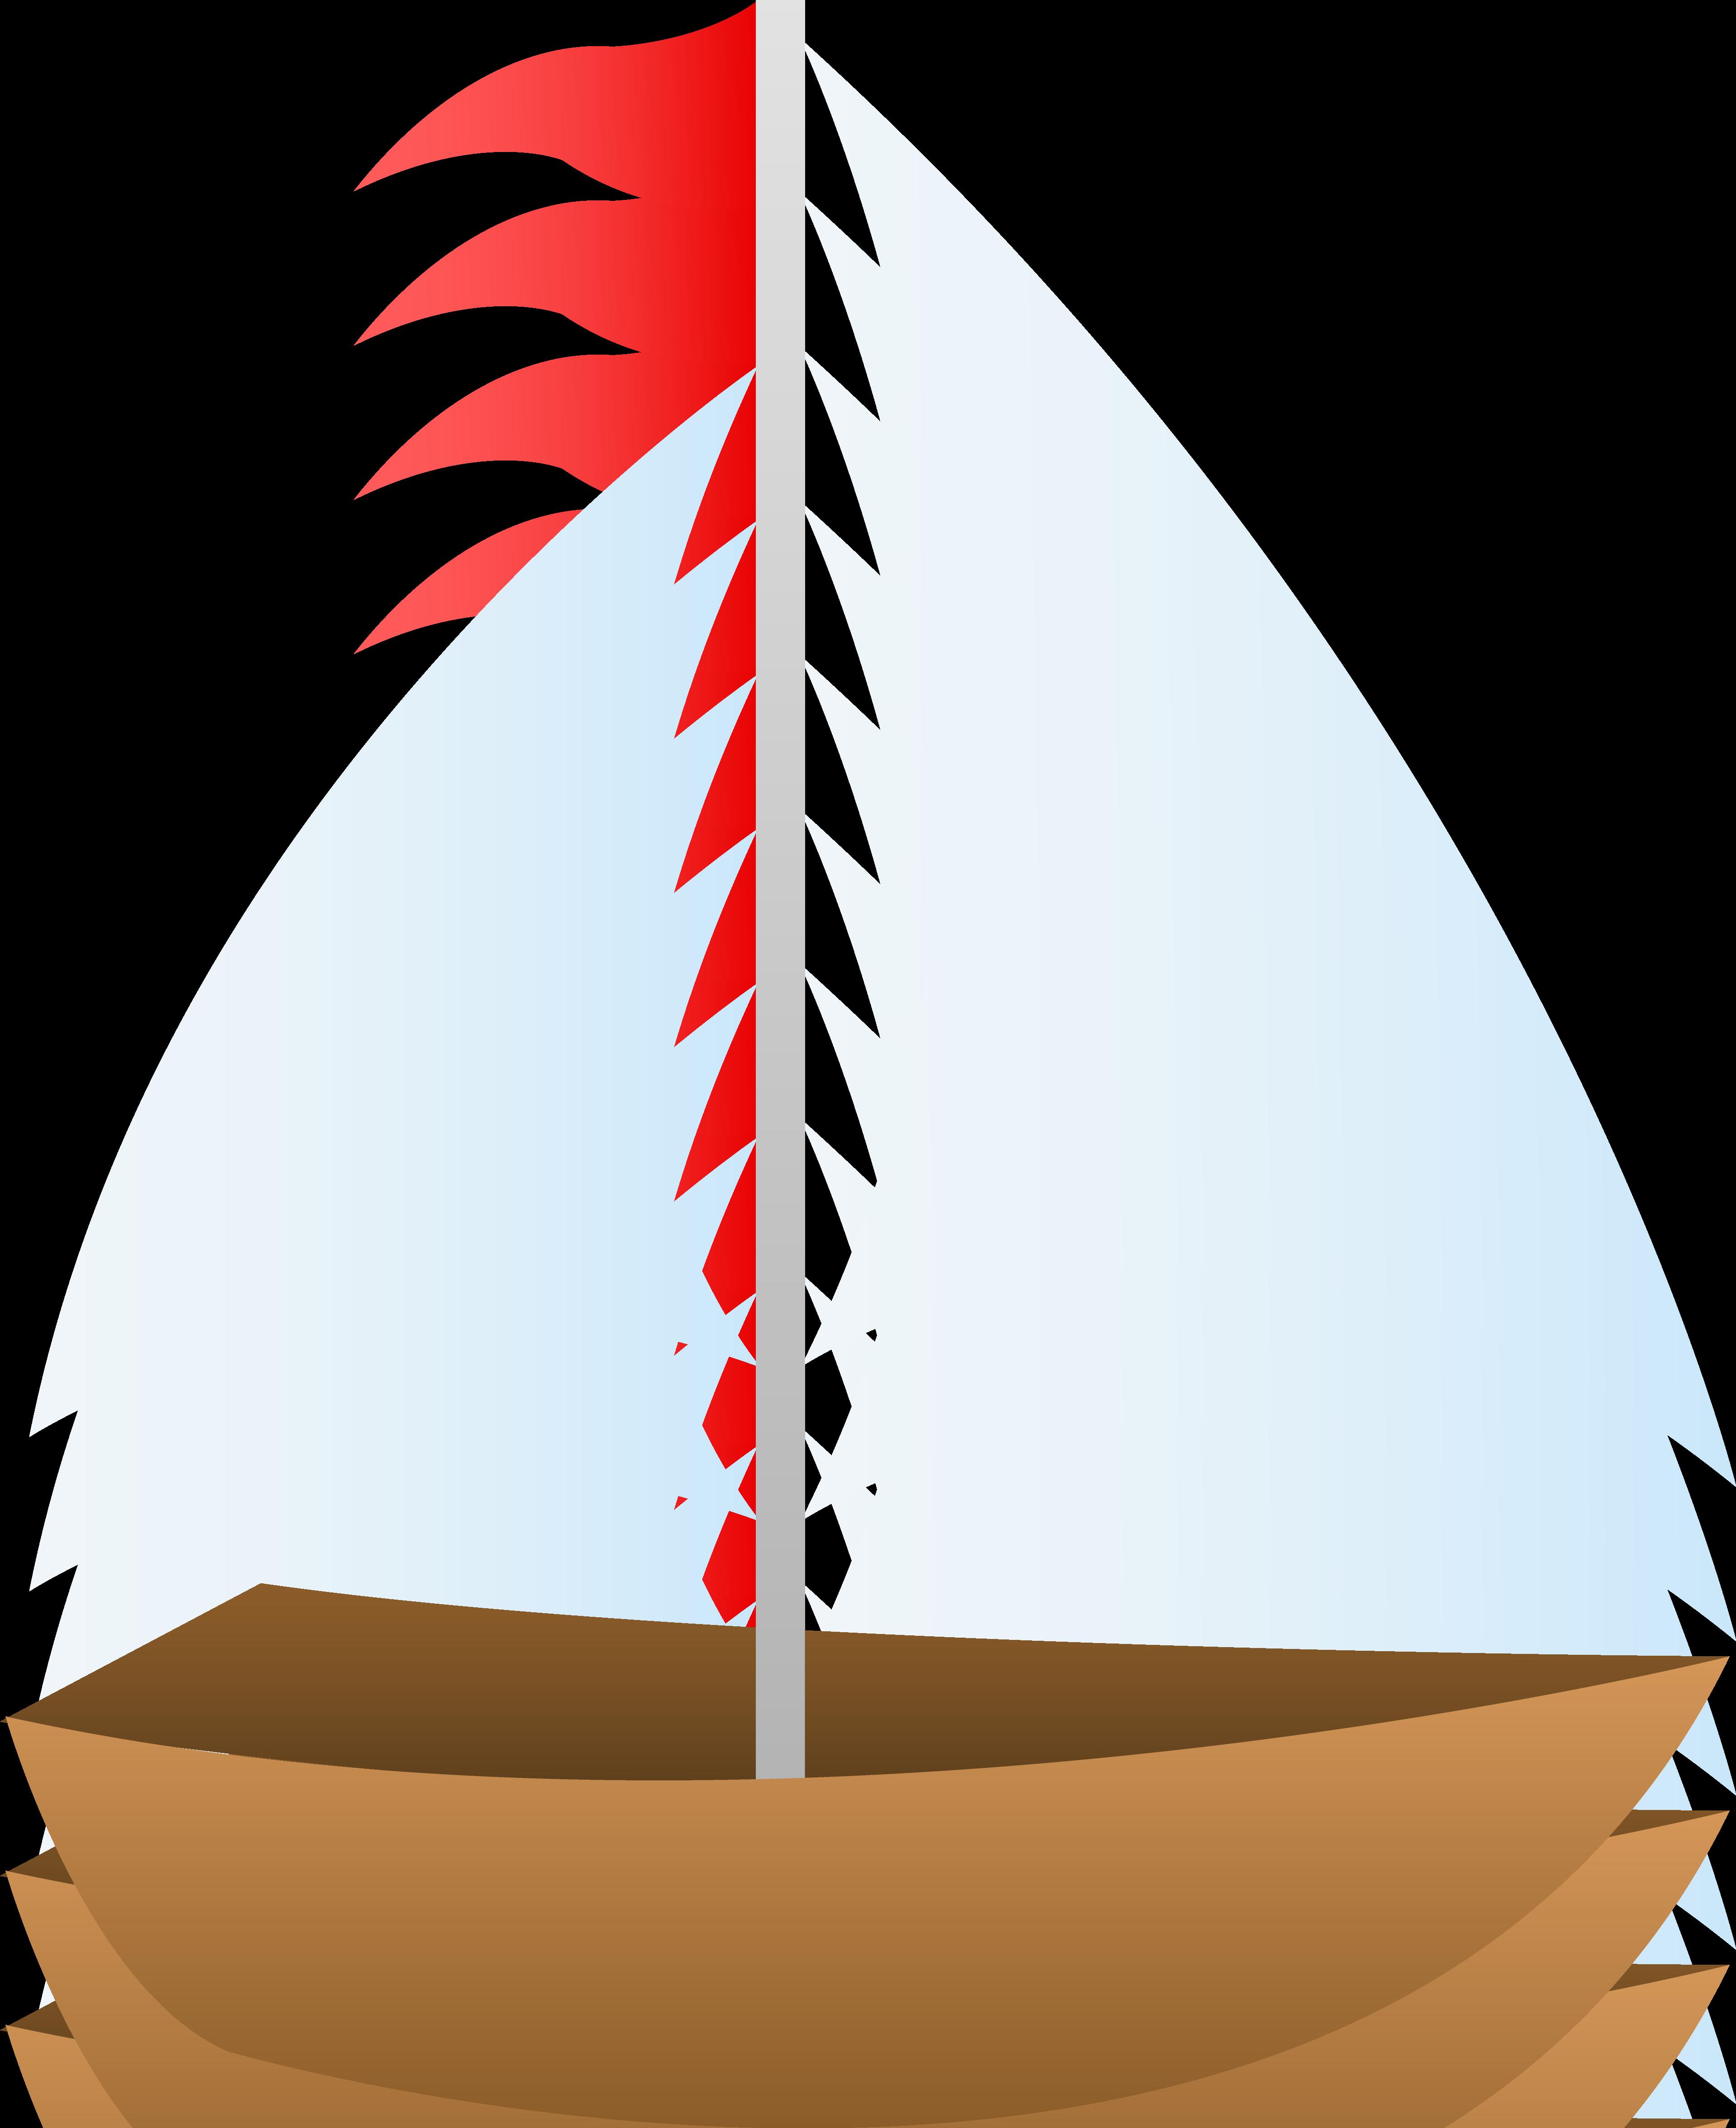 Red Sailboat Free Clipart-Red Sailboat Free Clipart-9